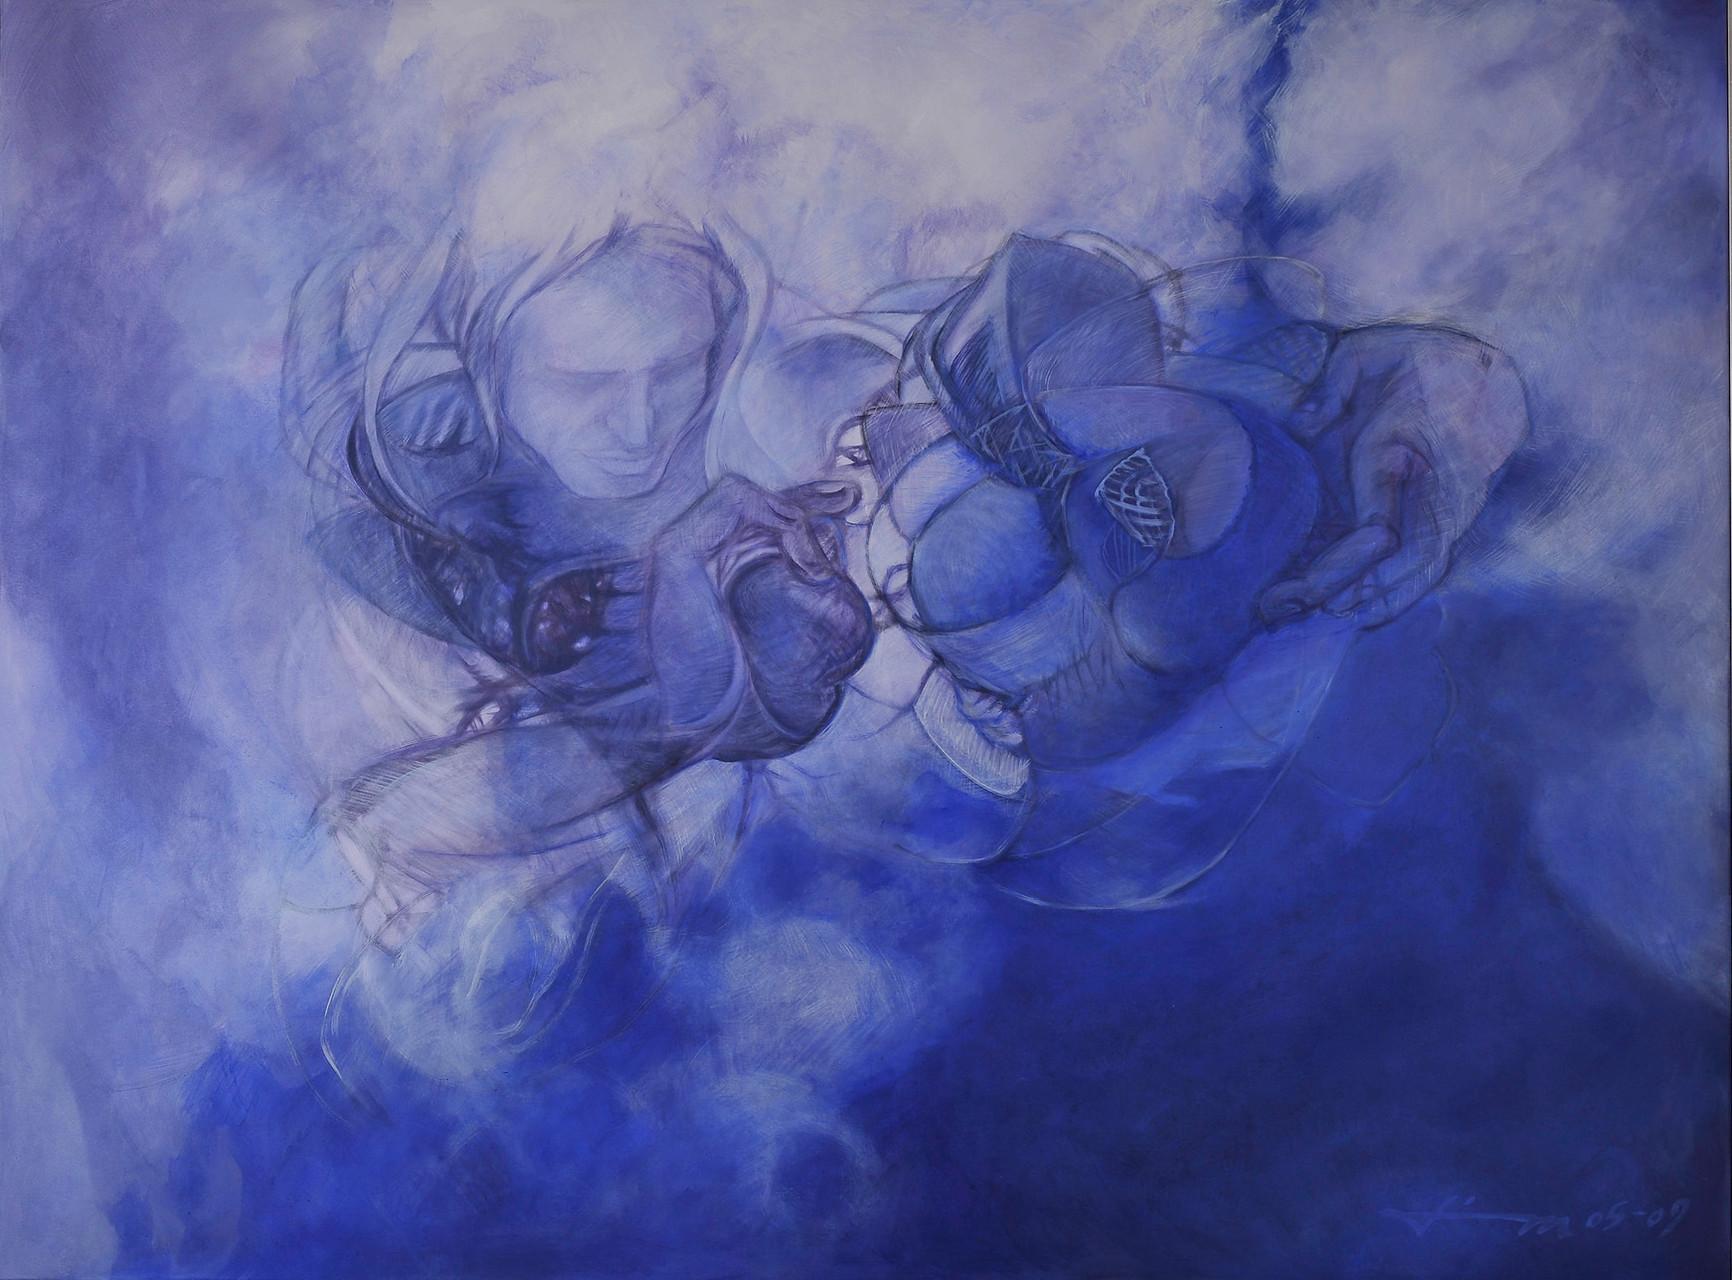 Erschaffung, Thomas M. Mayrhofer, 2005-2009, 195x145cm, Acryl auf Textil